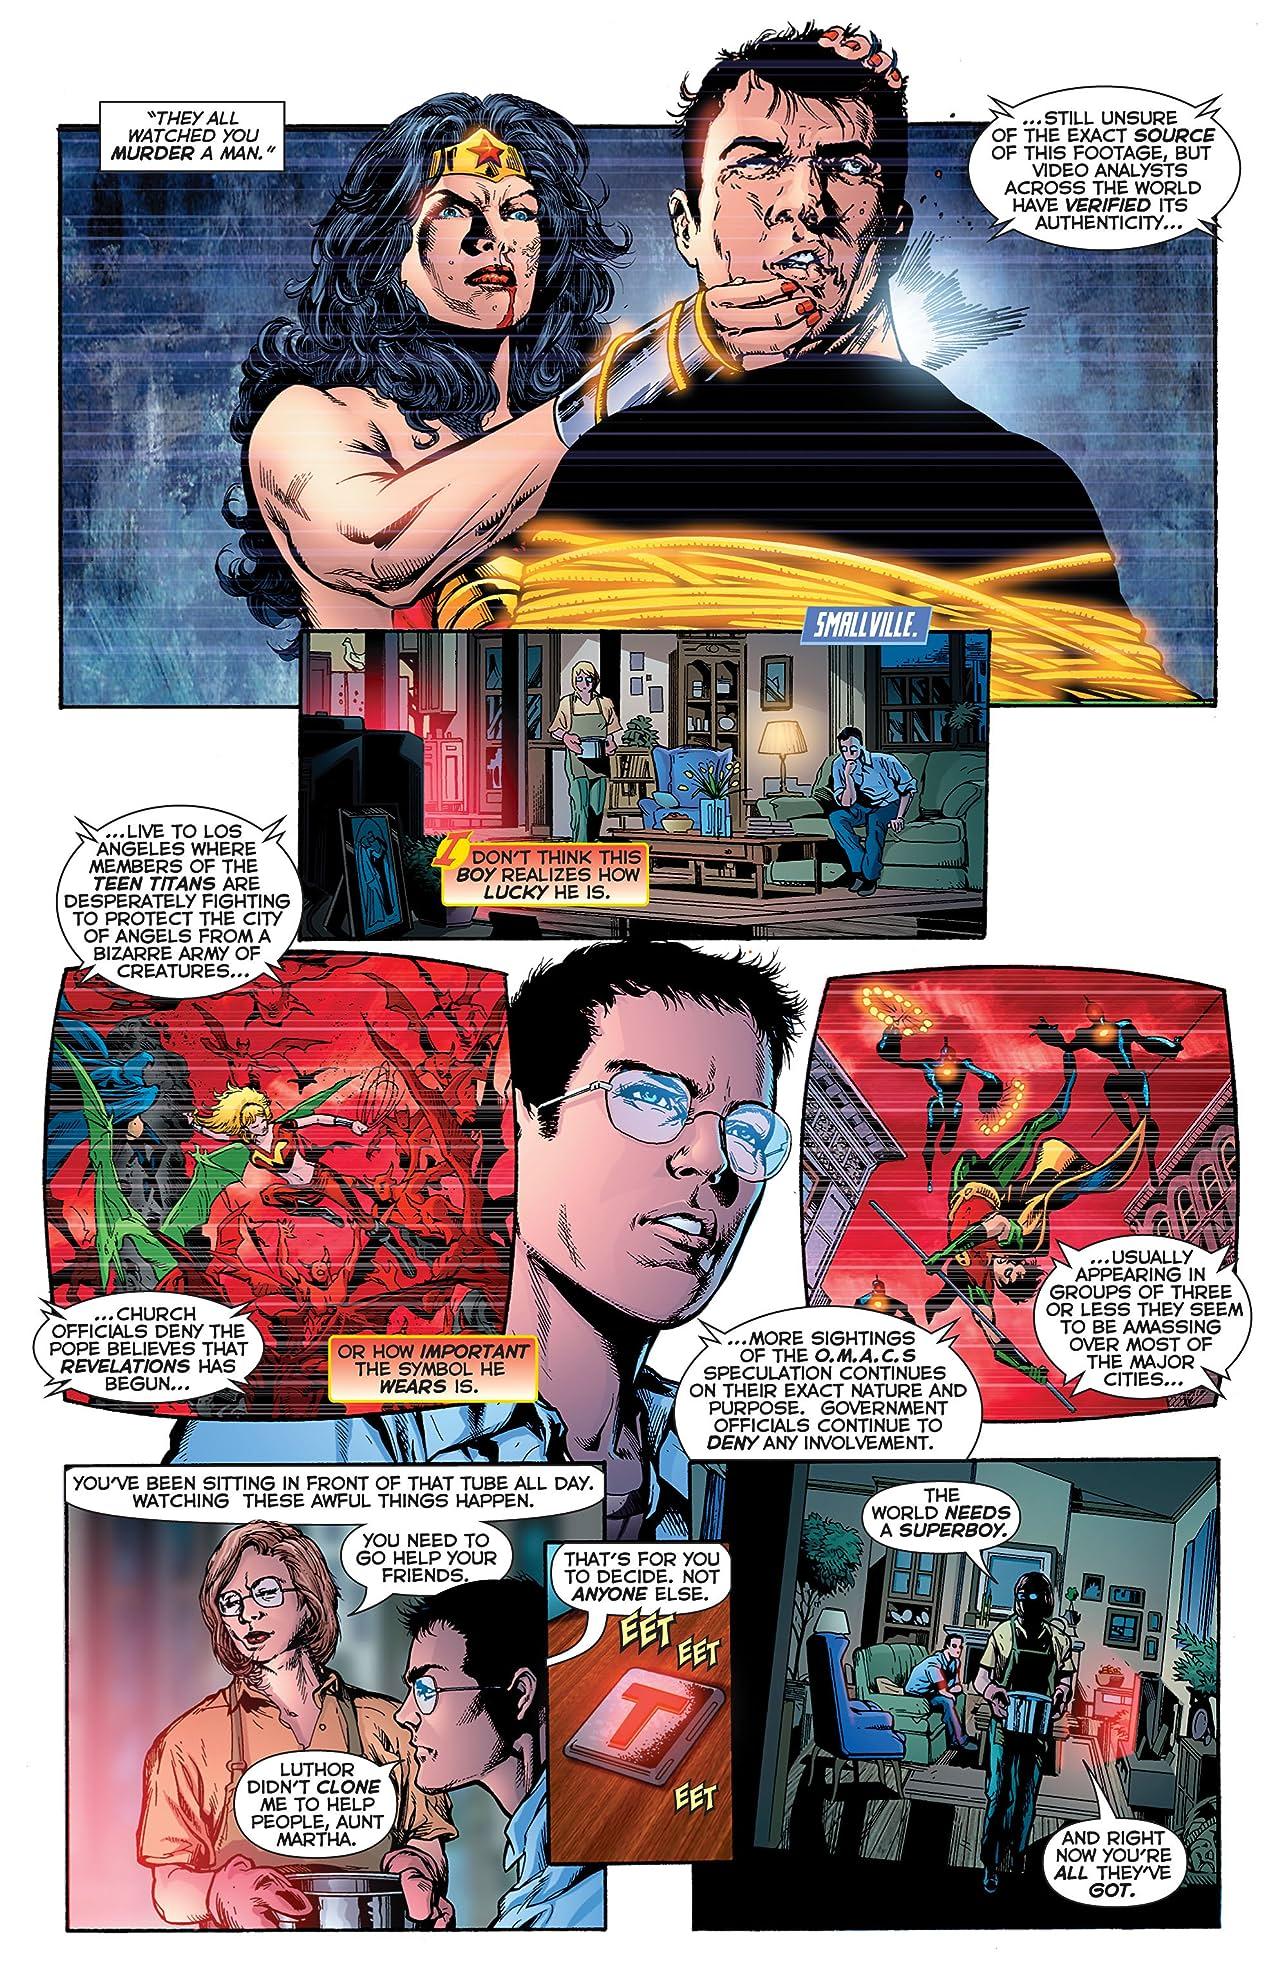 Infinite Crisis (2005-2006) #1 (of 7)